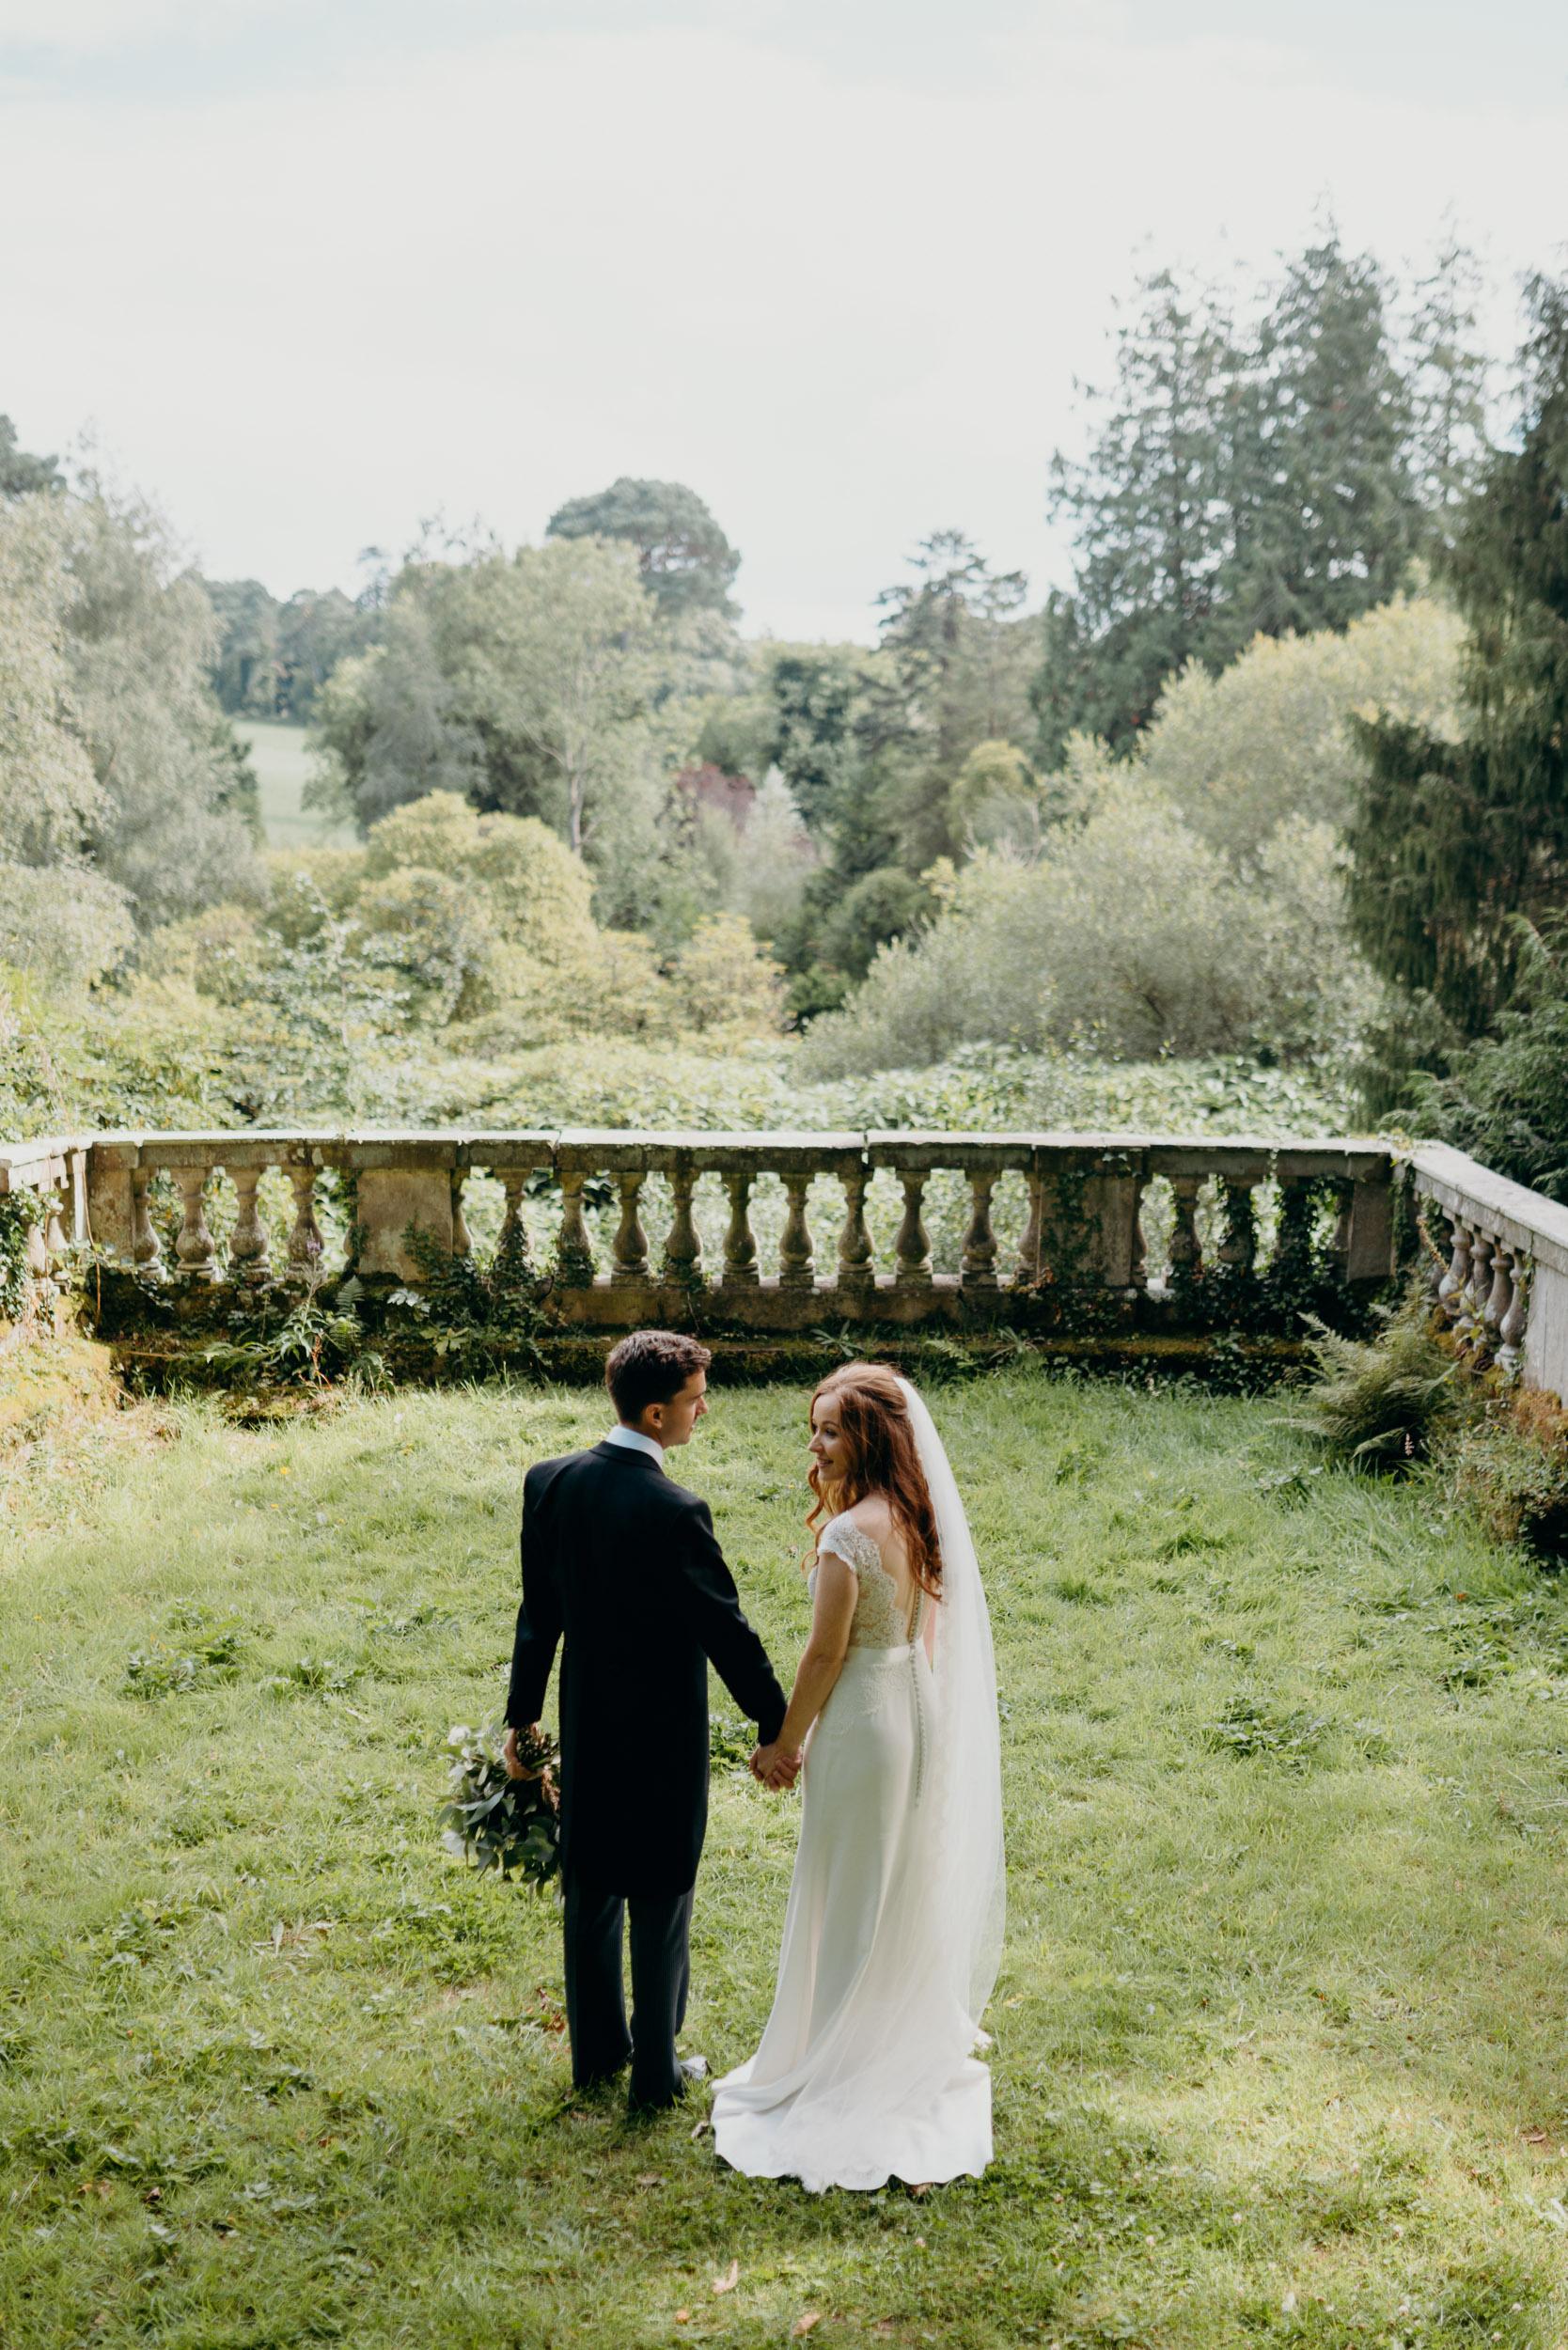 drenagh estate wedding photography-80.jpg